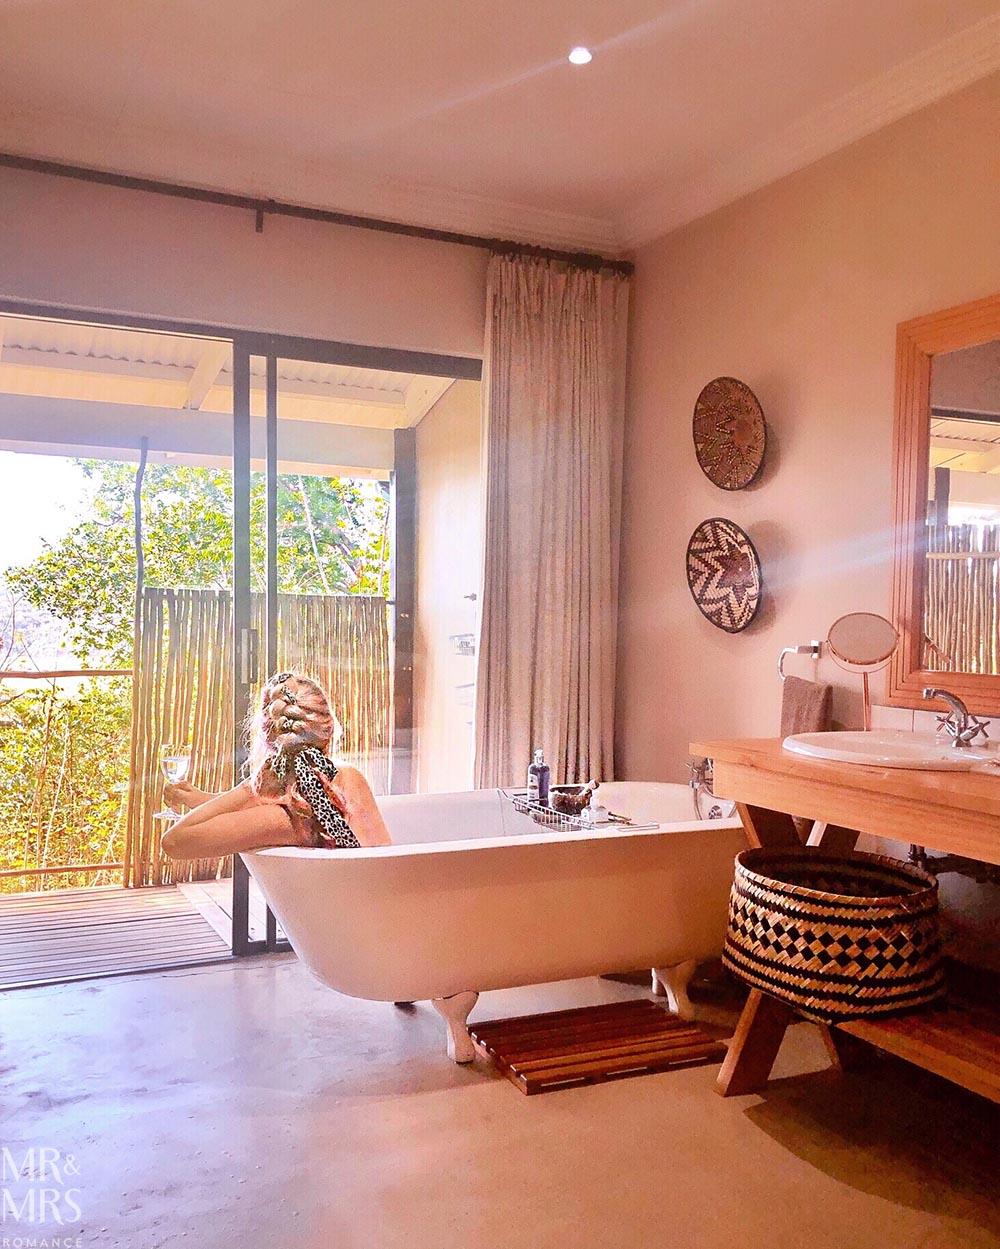 South Africa Tourism - Fugitives' Drift Lodge bath